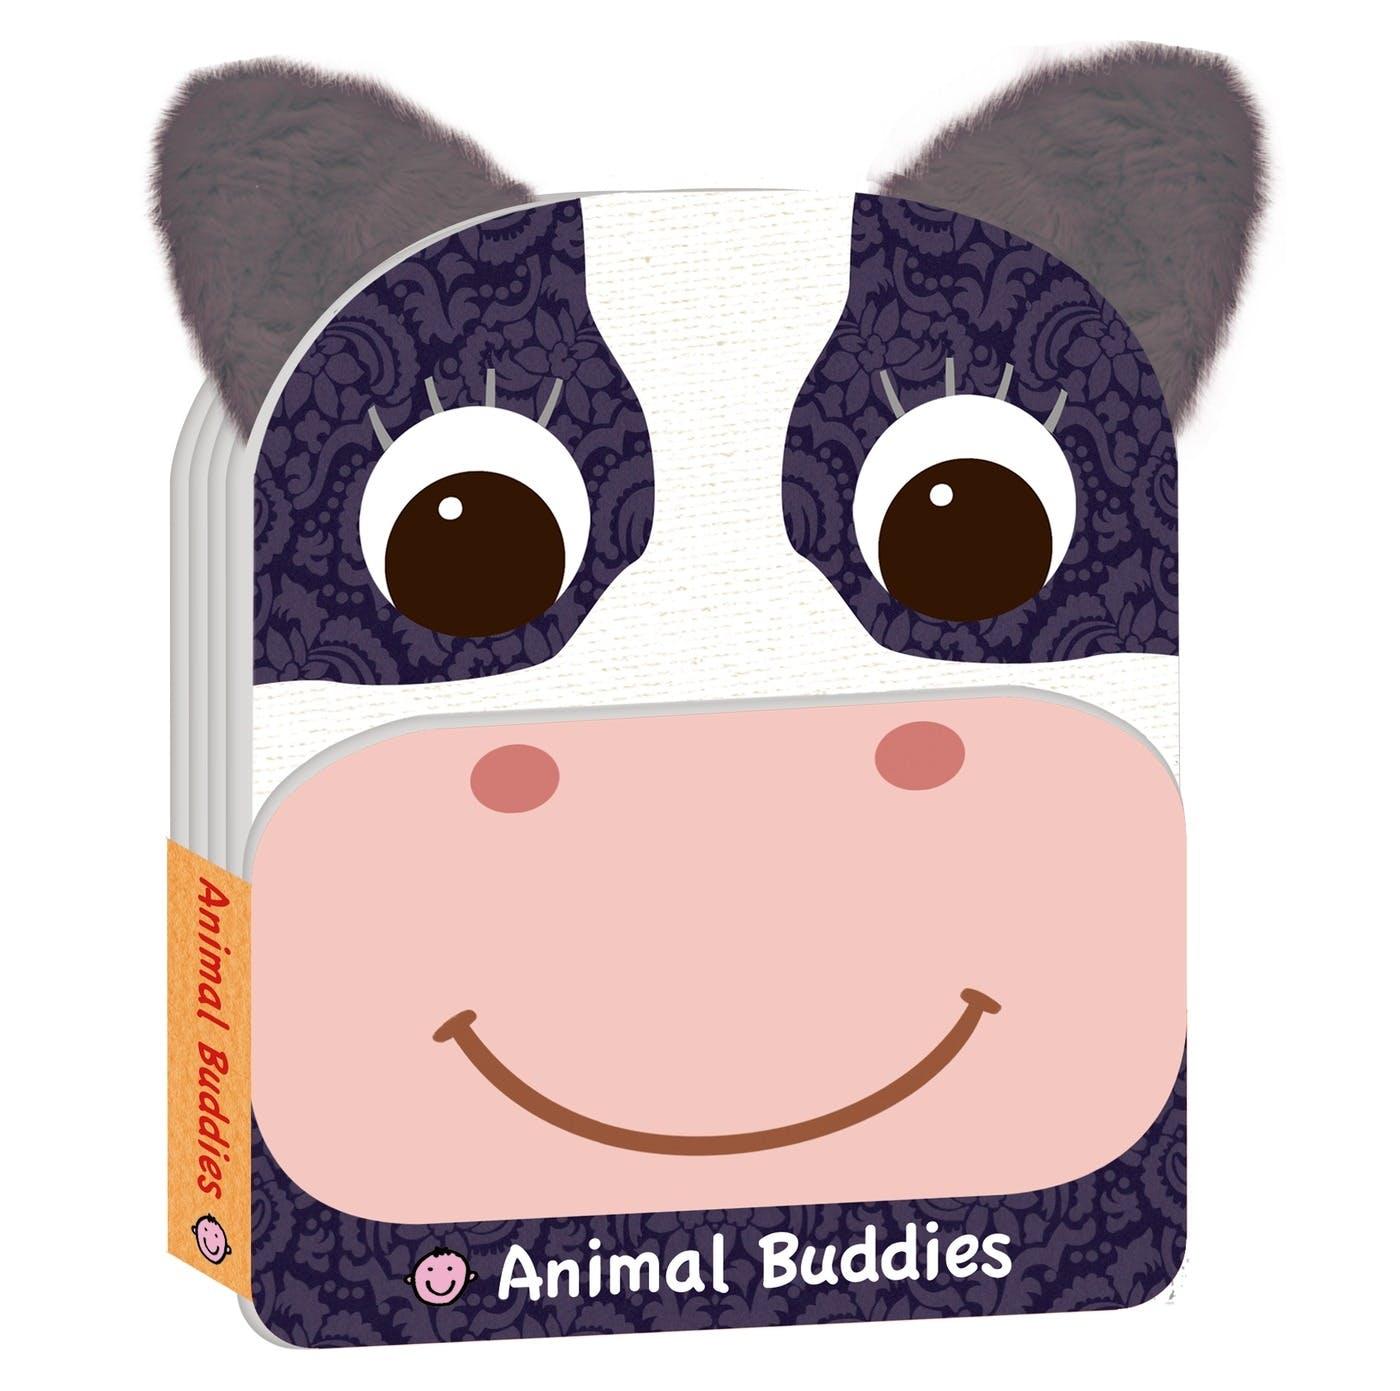 Image of Animal Buddies: Cow